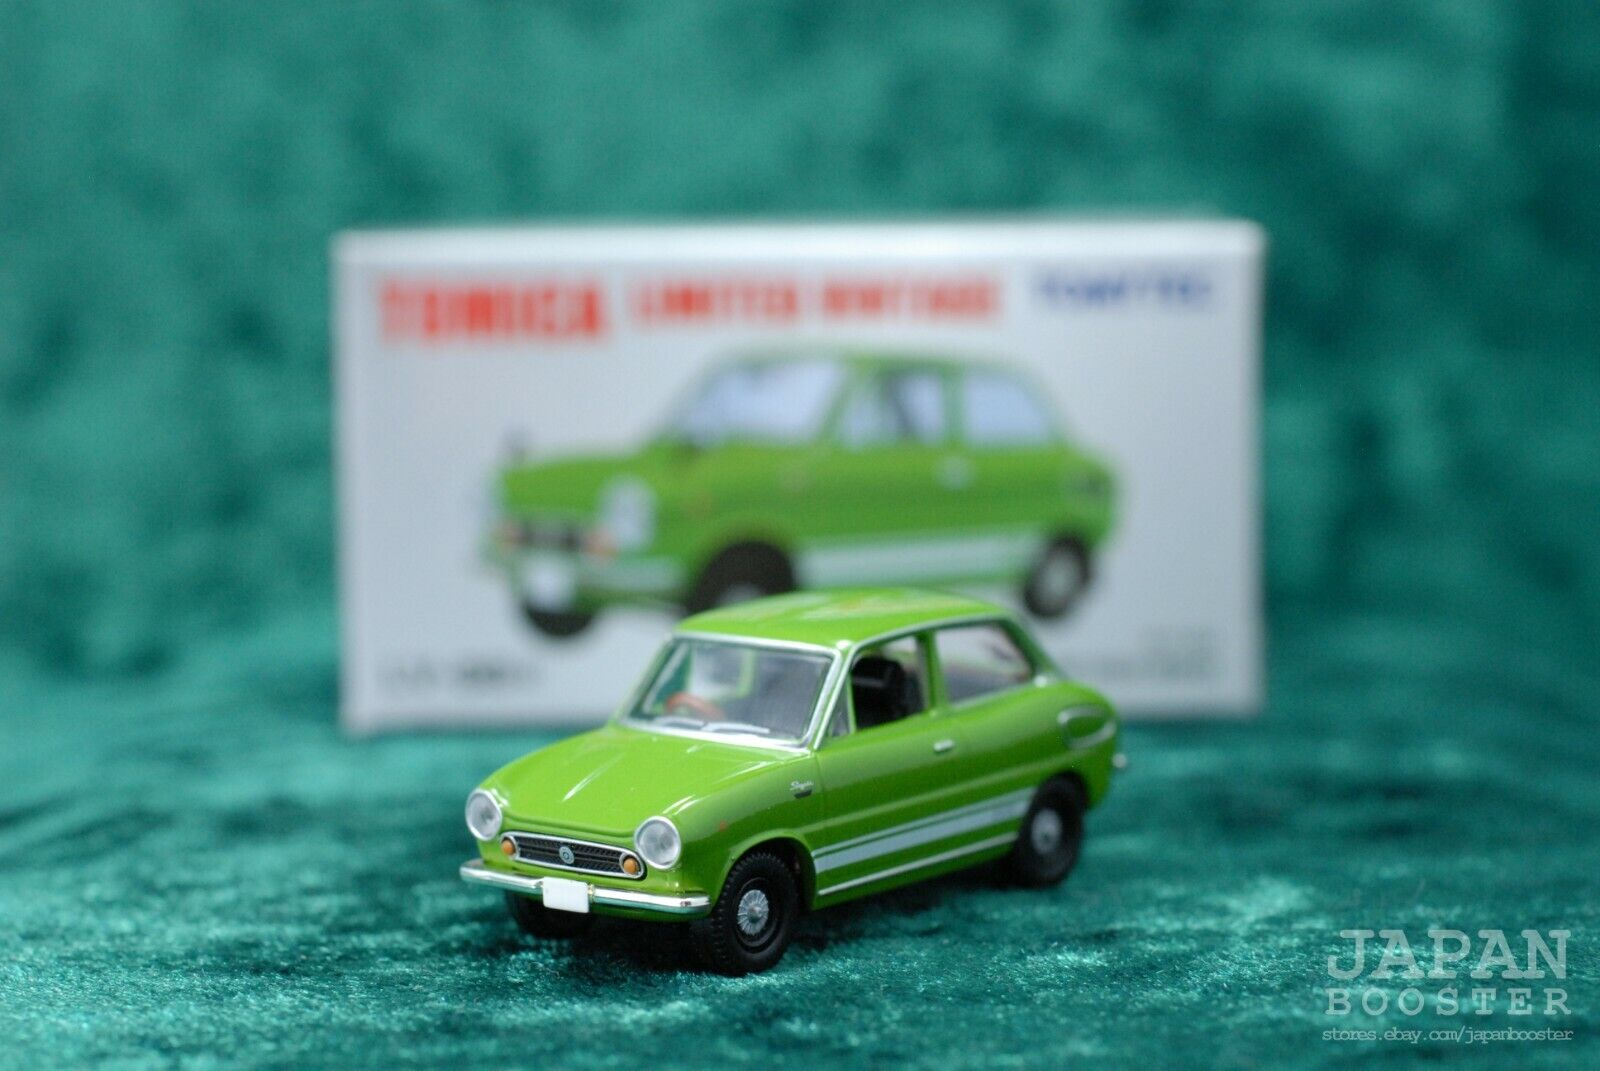 T55 Tomica Limited Vintage Lv 88a Suzuki Fronte Ss 360 For Sale Online Ebay